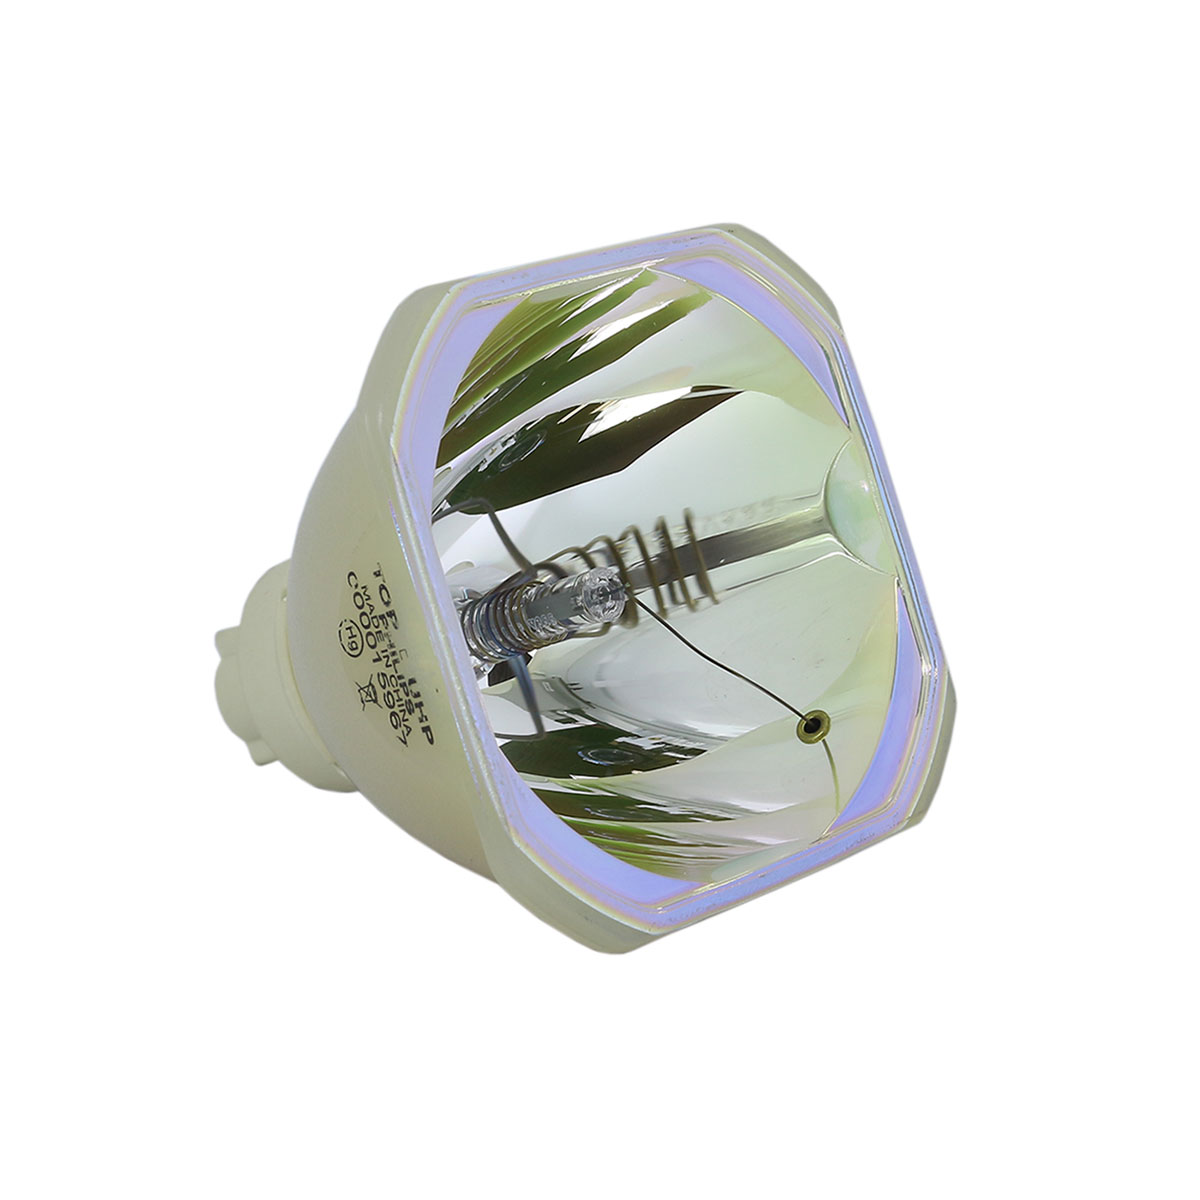 Philips xxxx 656 xxxxx Philips Projector Bare Lamp